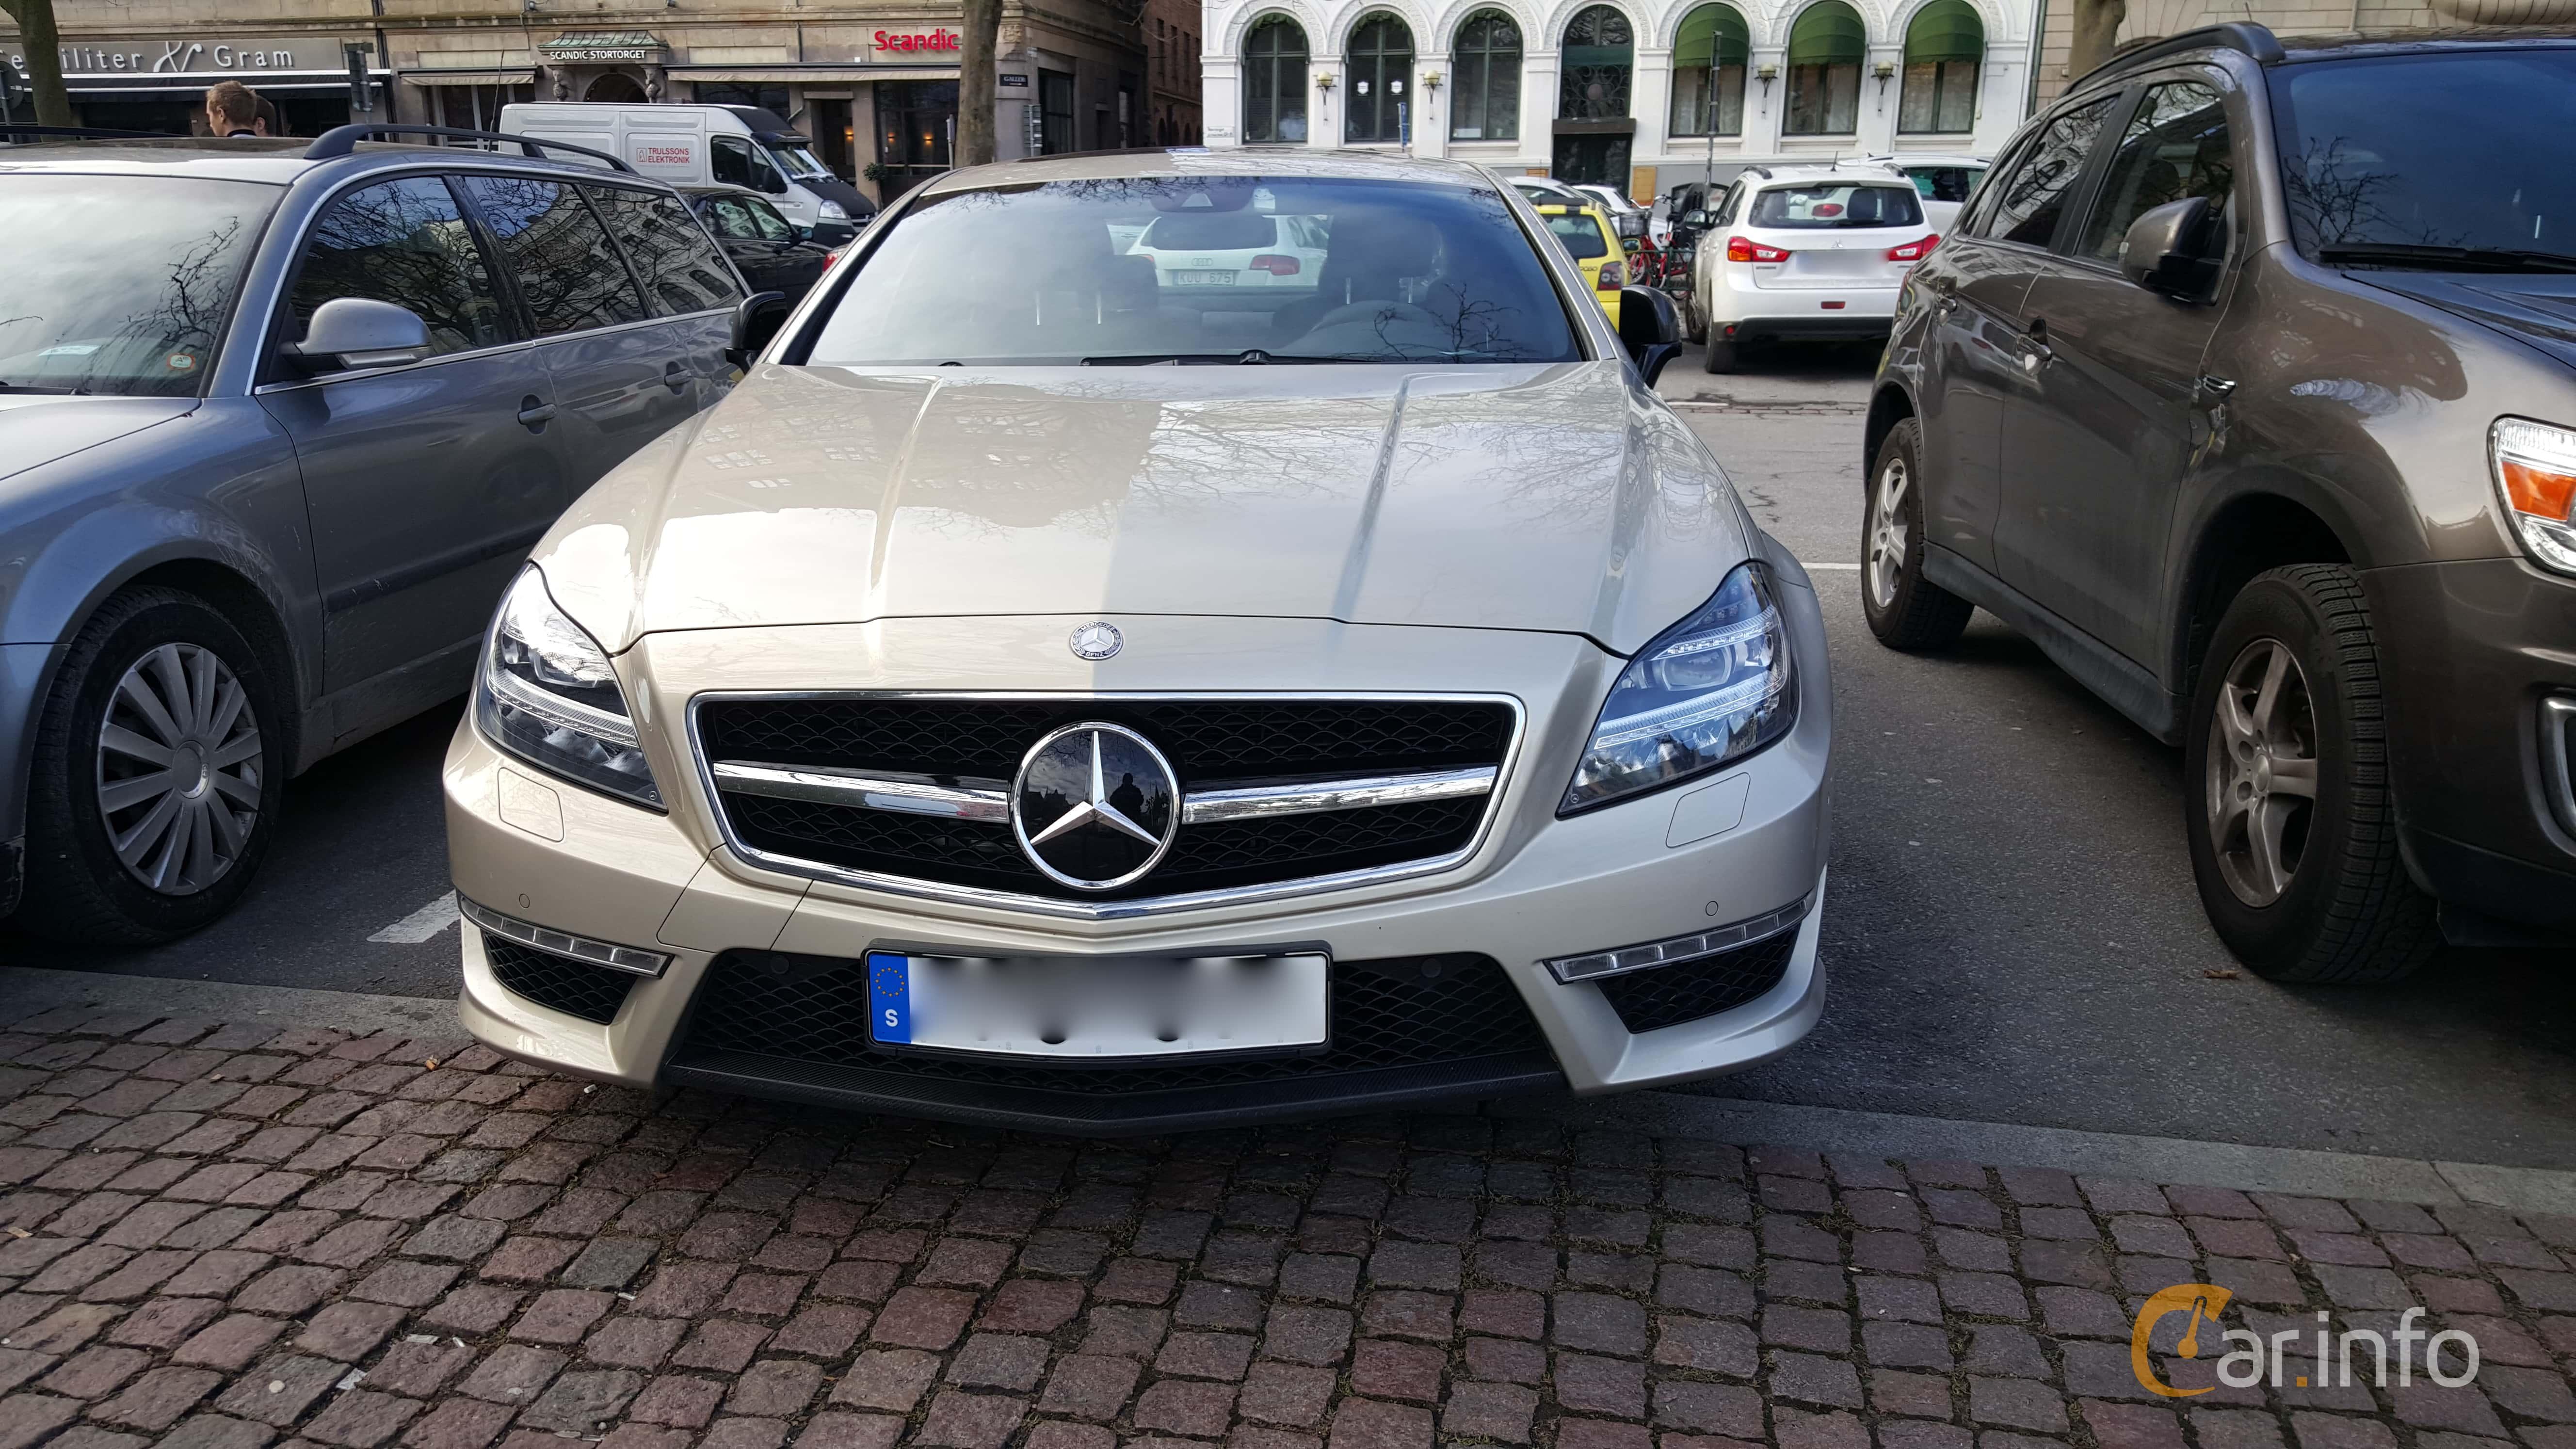 Mercedes Benz CLS Class Coupé C218 by jonasbonde